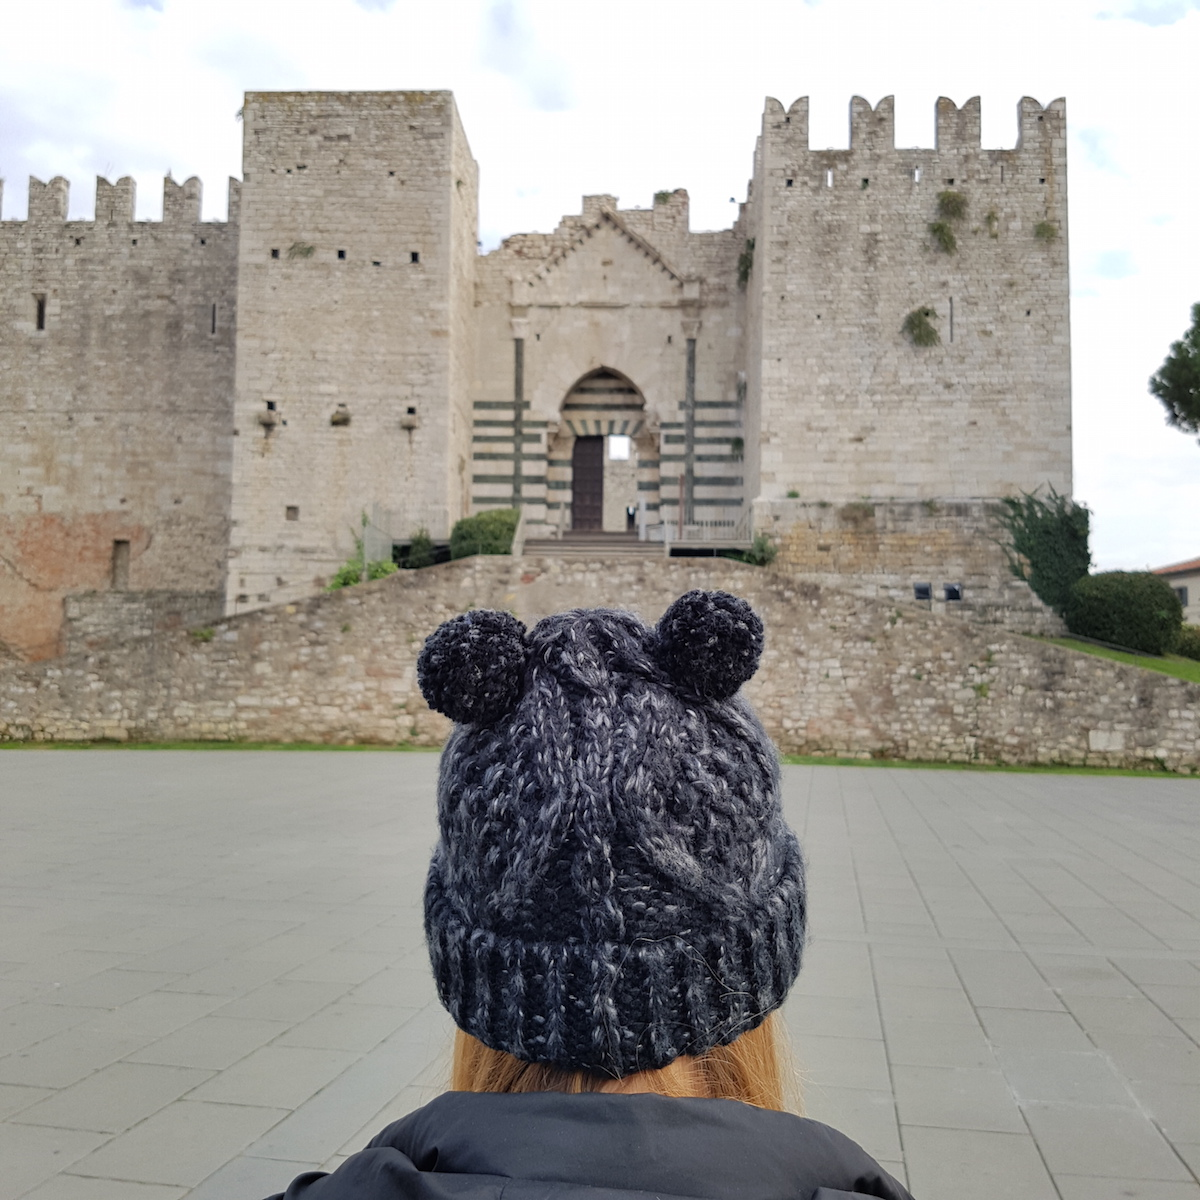 Prato-by-Style-and-Trouble-006-Castello-Imperatore